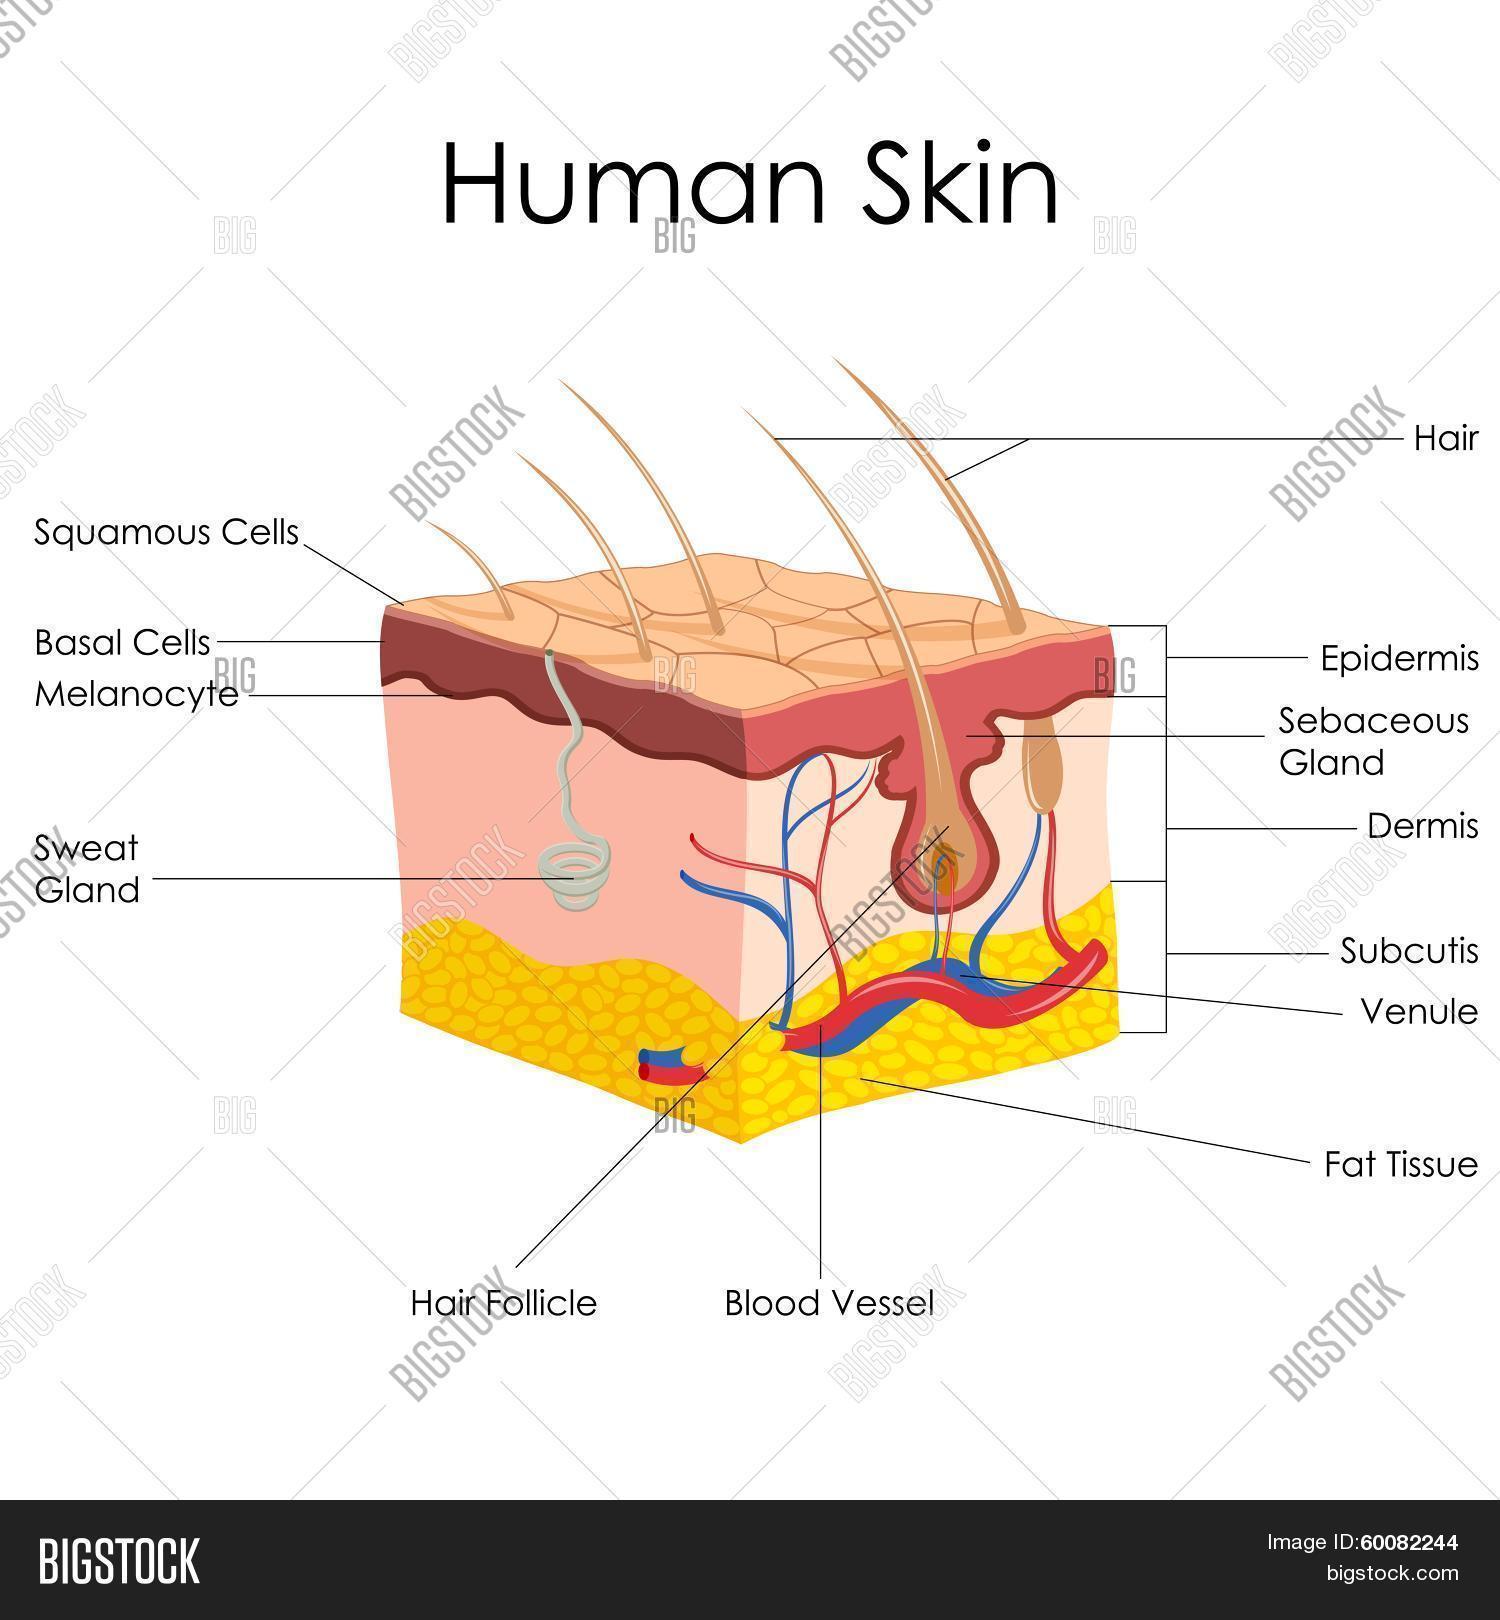 Human Skin Anatomy Photo Stock